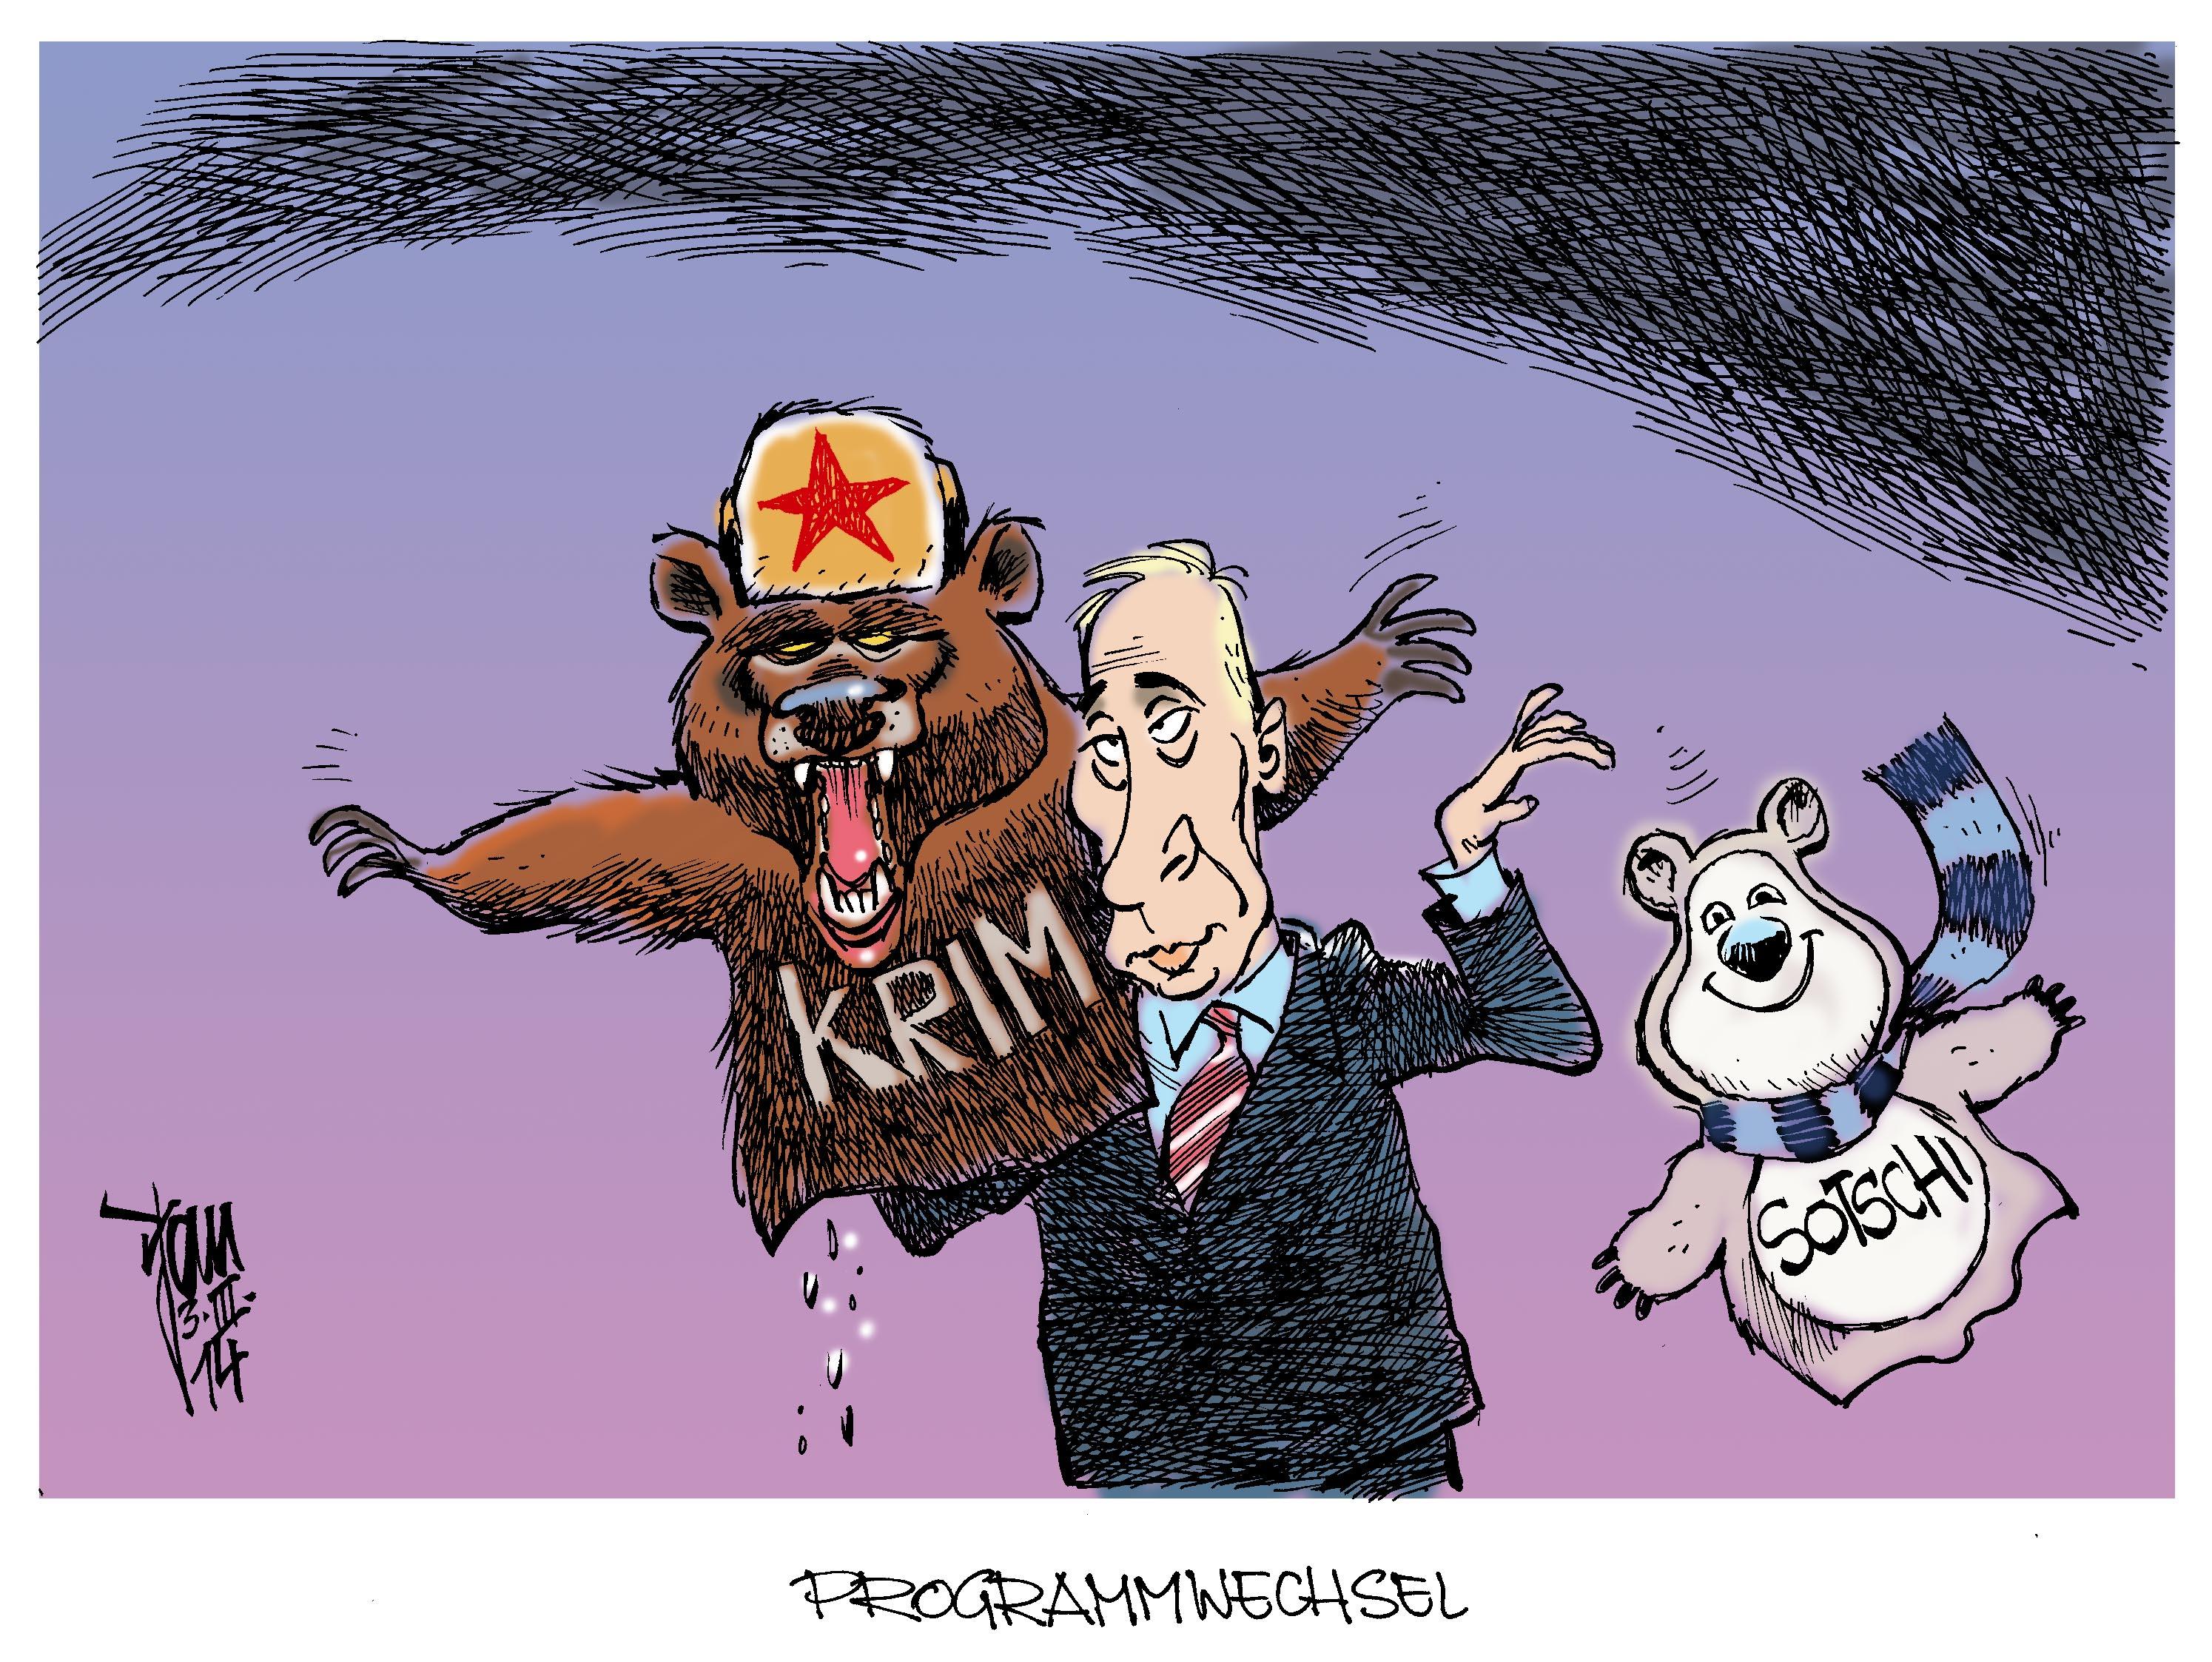 Aktuelle Karikaturen: Krim-Krise